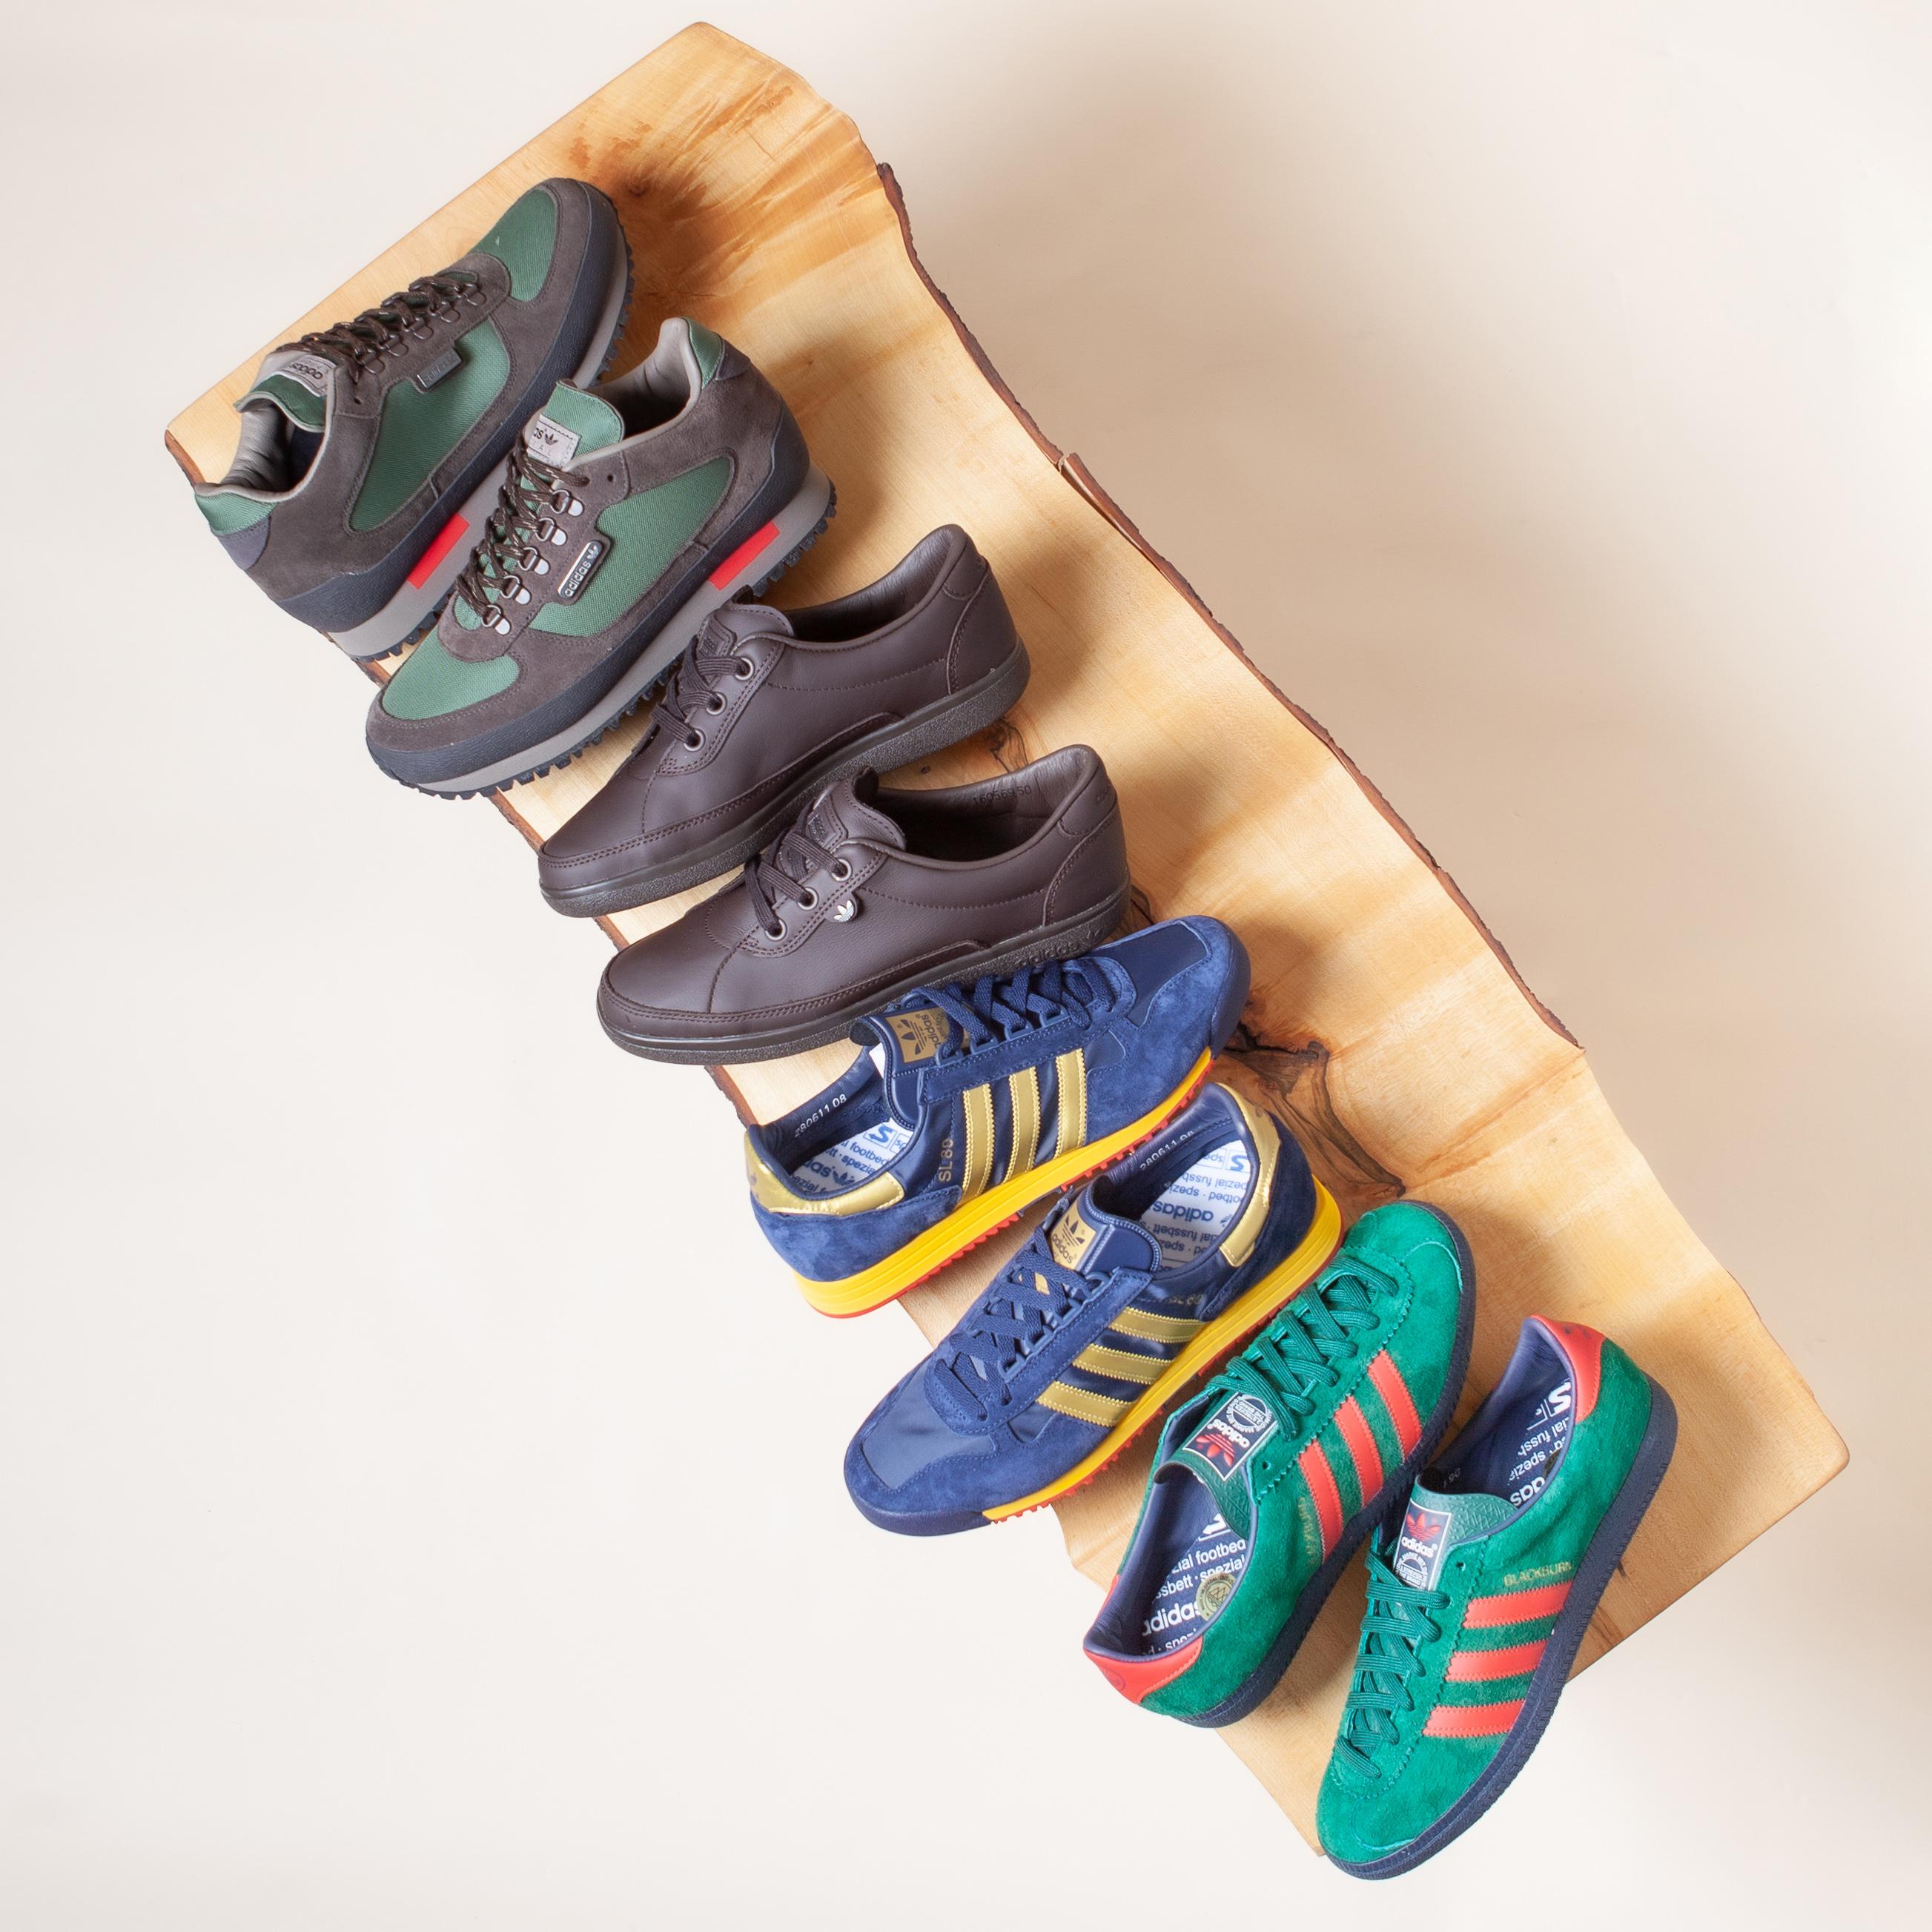 adidas spezial collection 2019